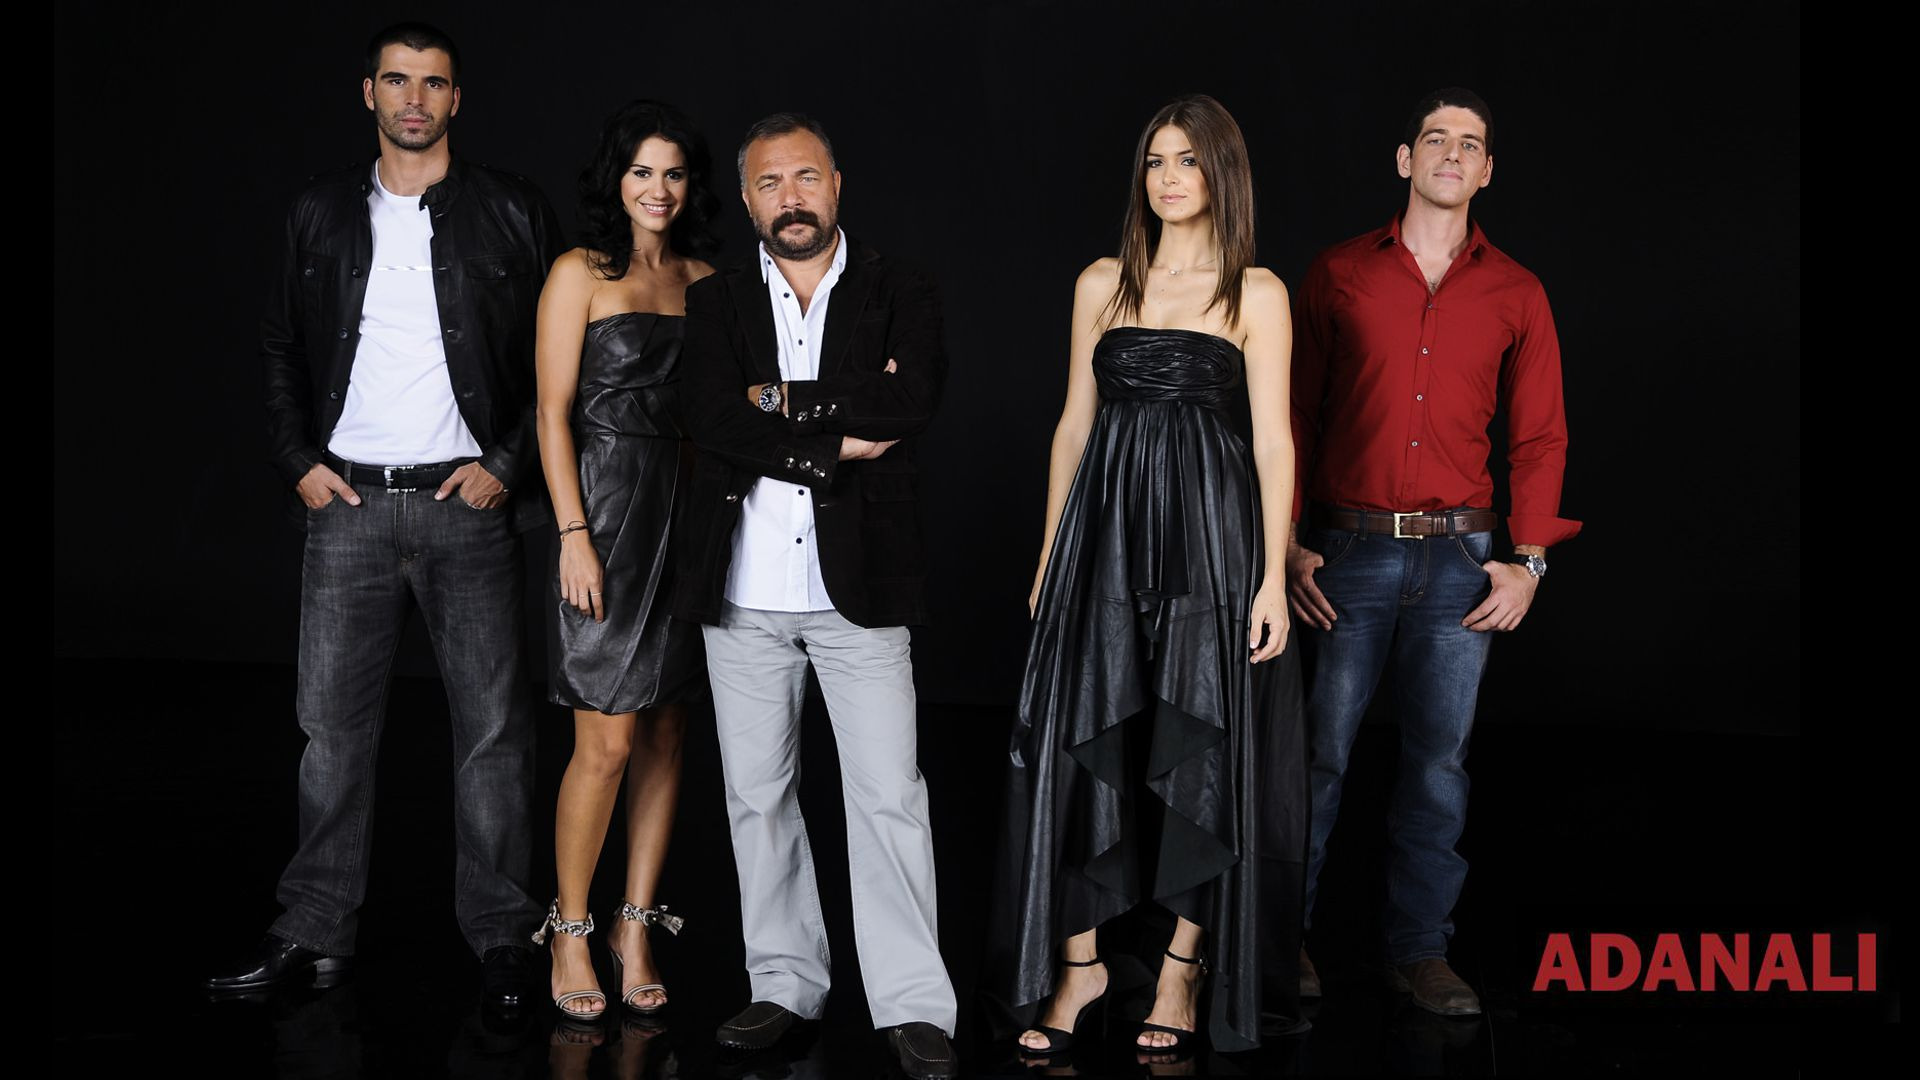 Show Adanalı